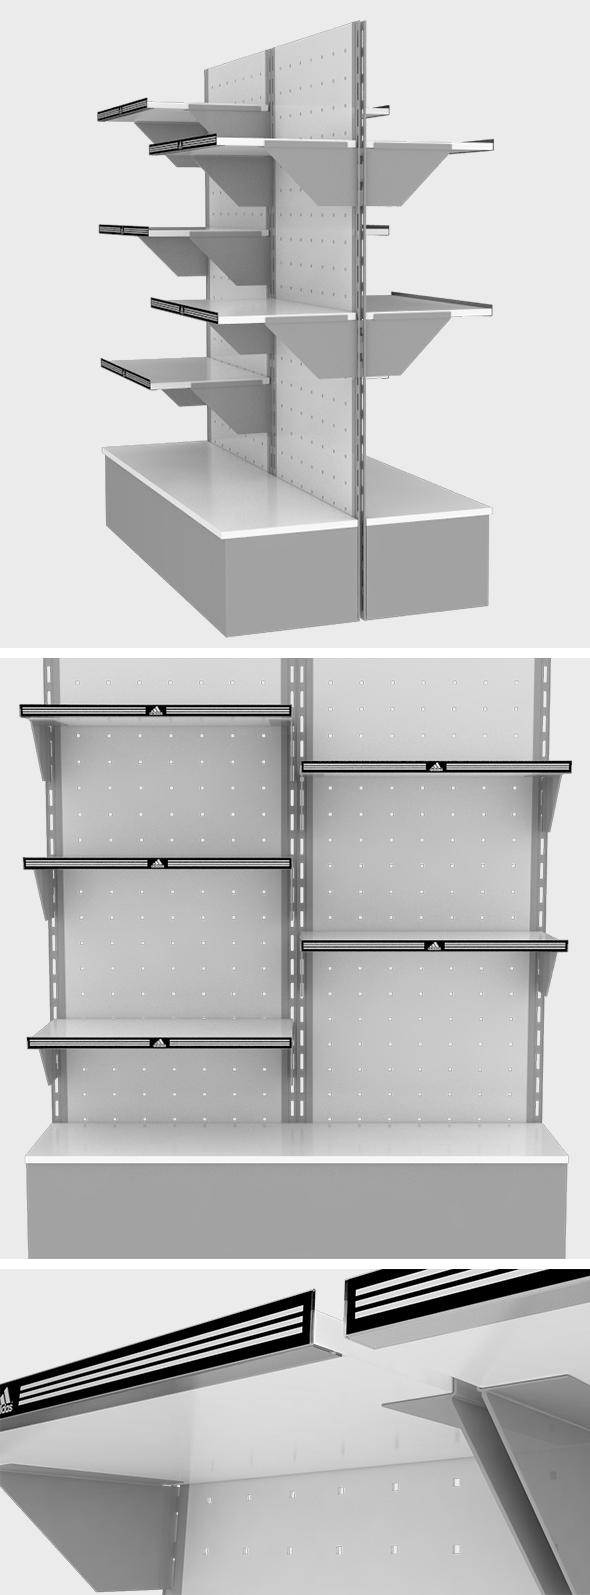 Modular Shop Shelving Unit - 3DOcean Item for Sale